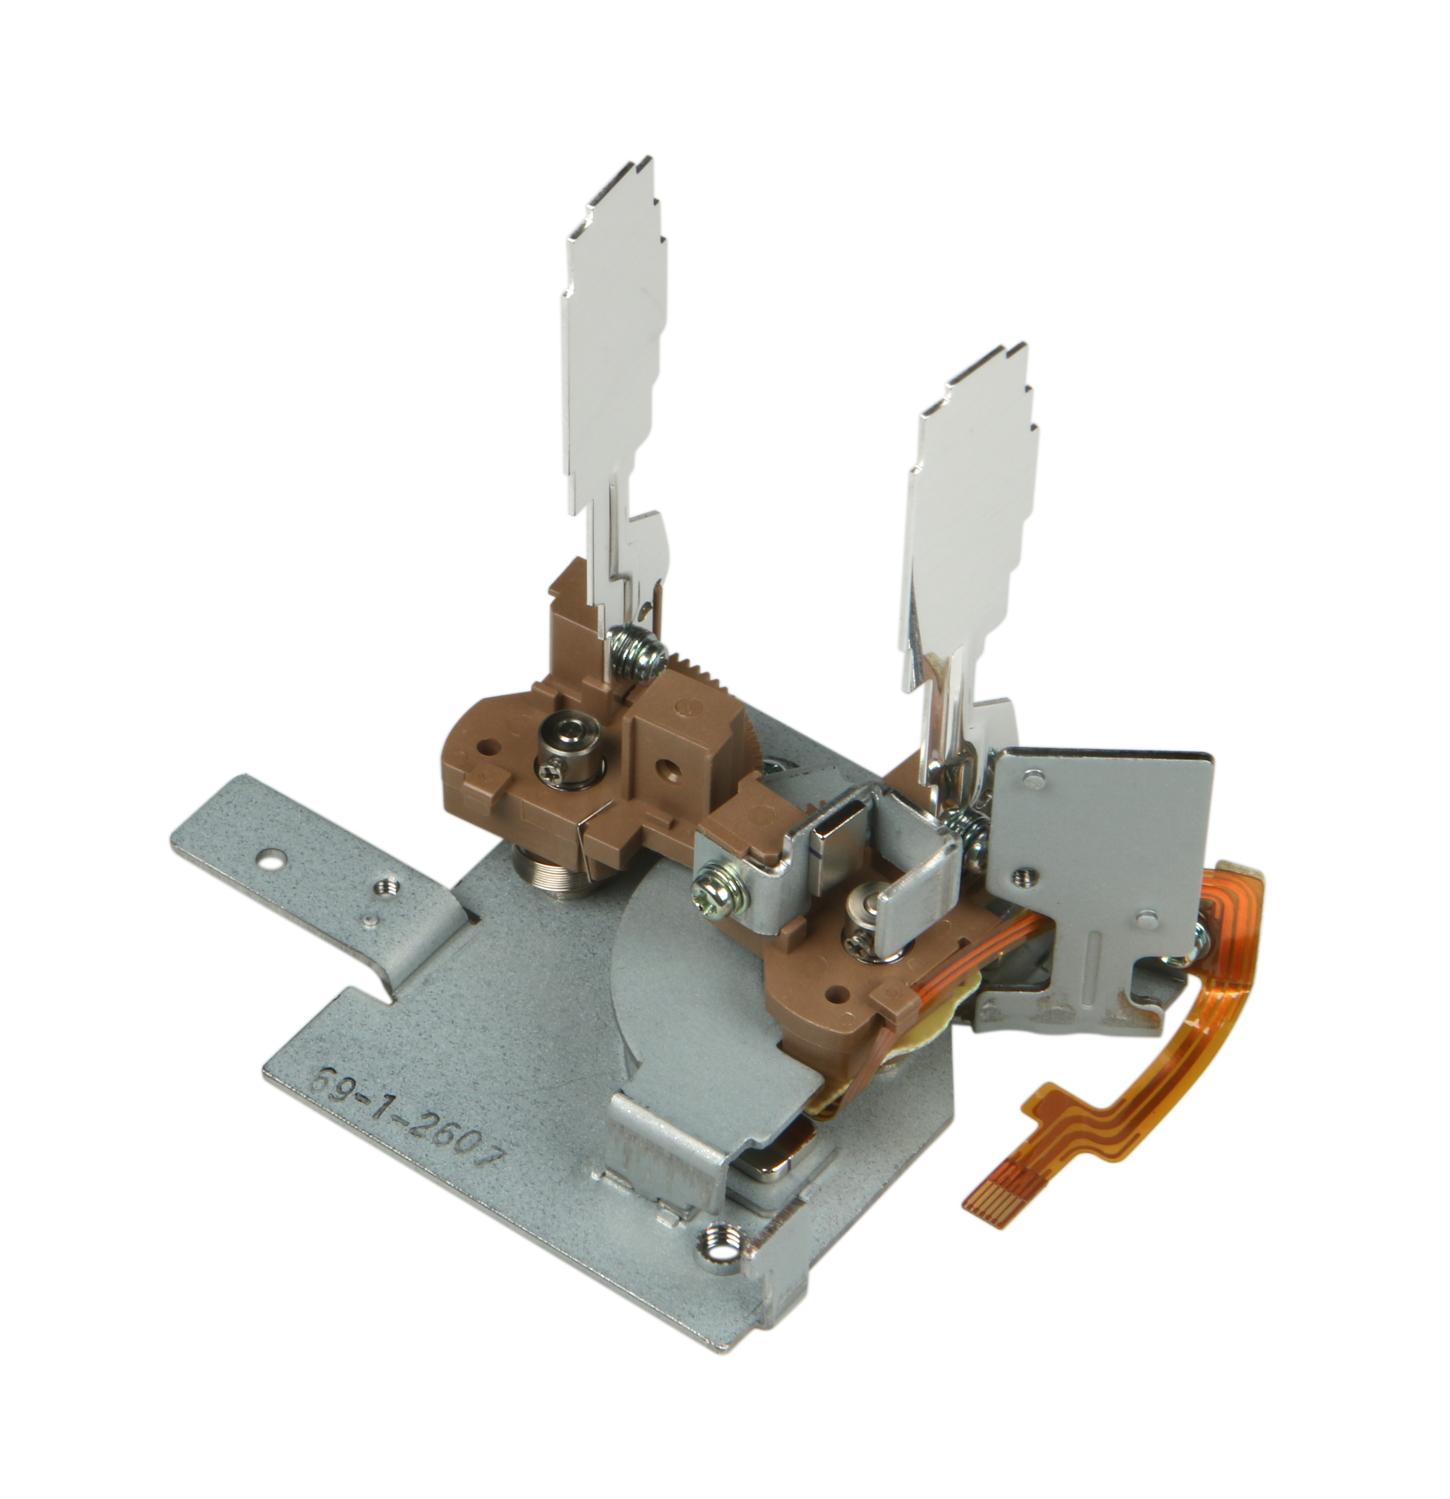 PTAX100U Iris Assembly